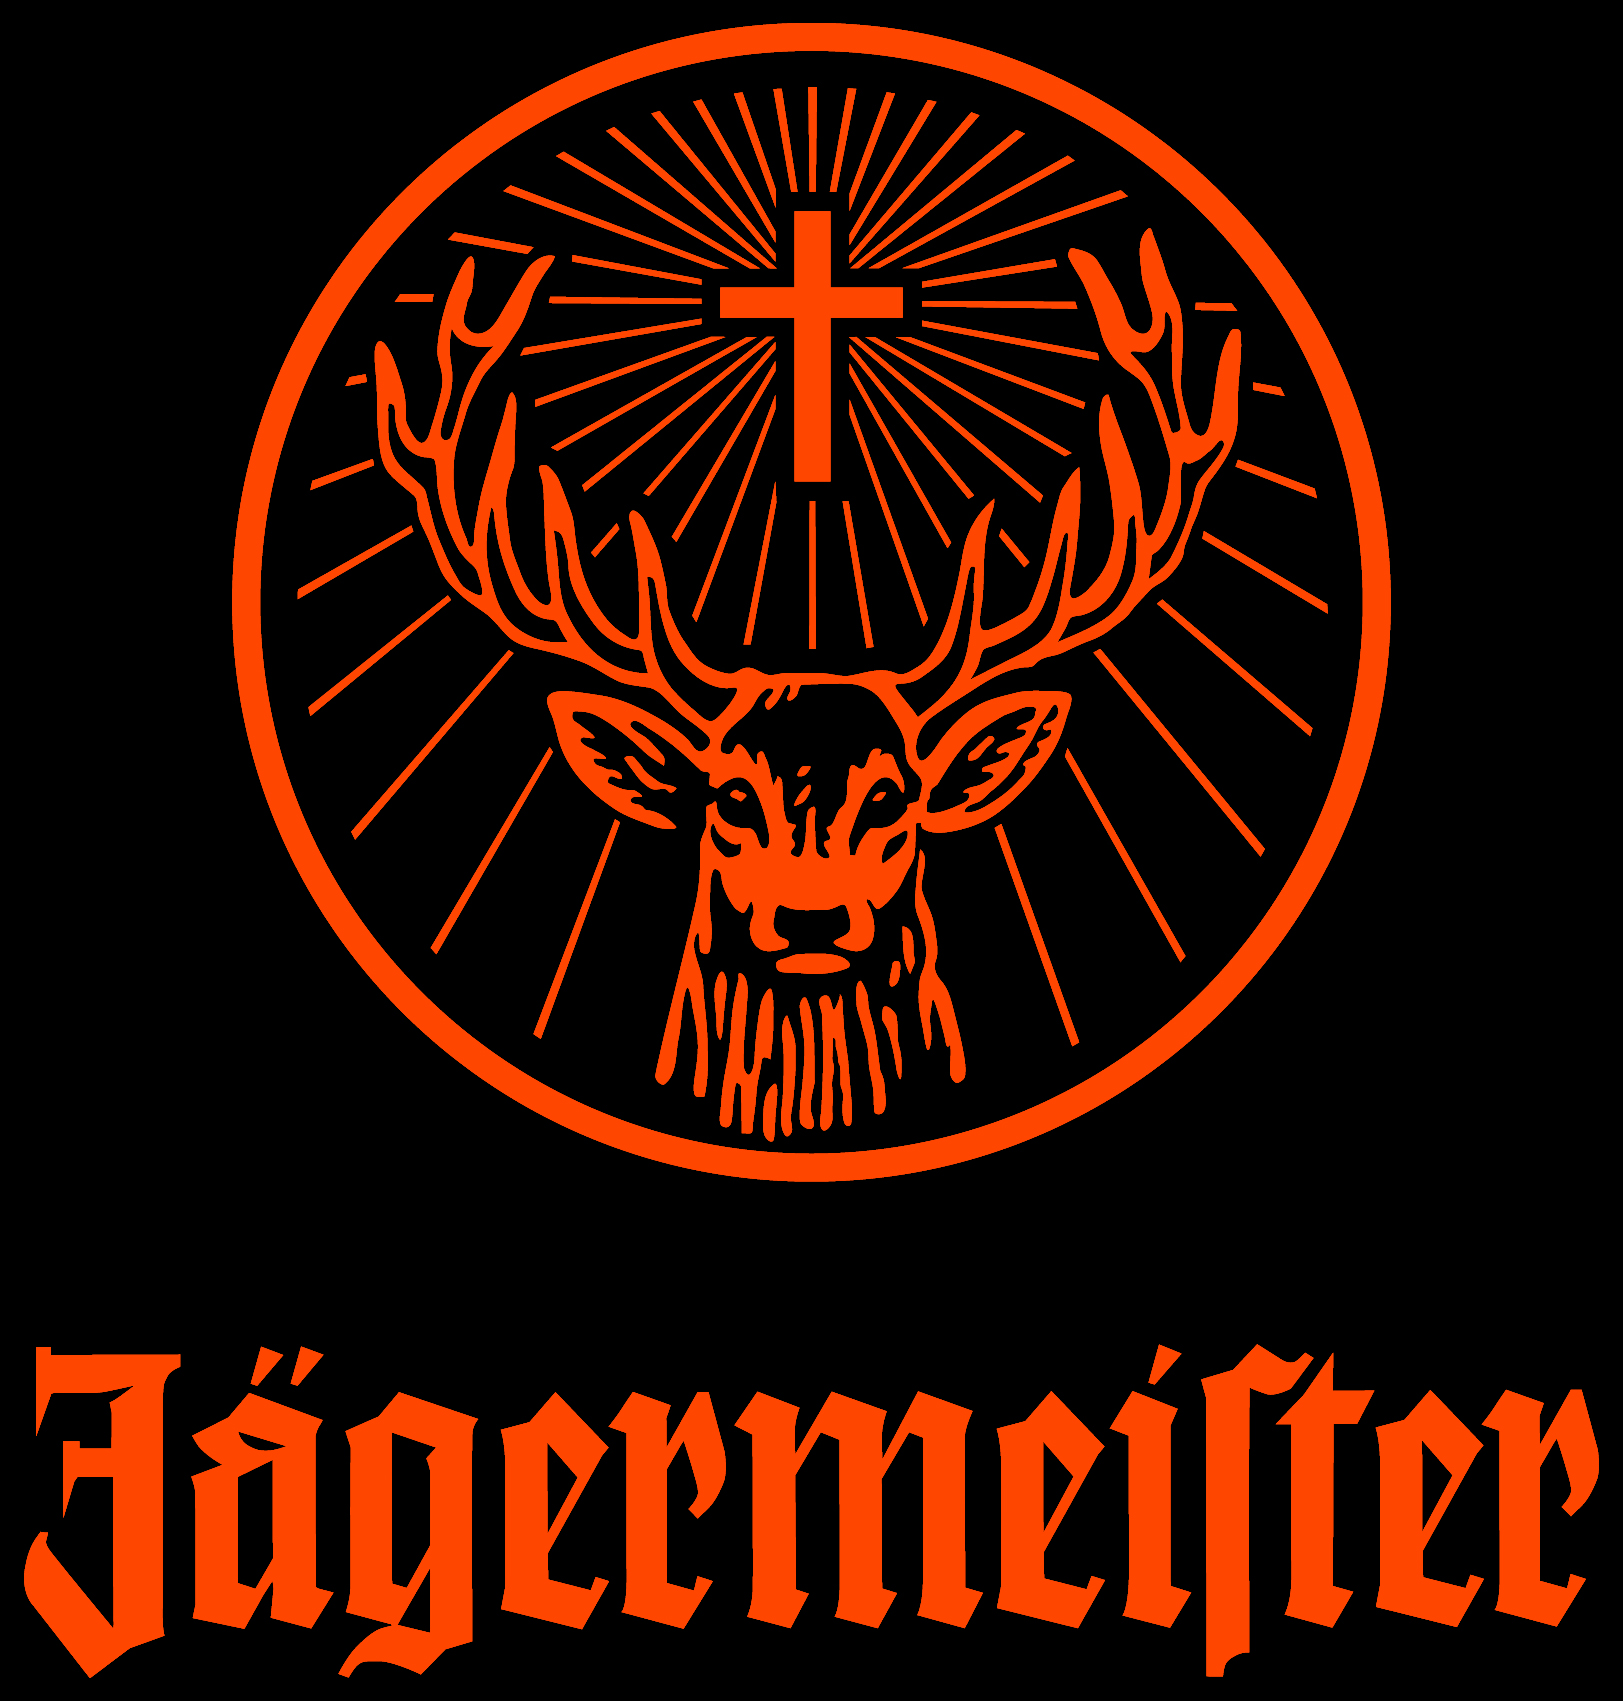 Jagermeister Logo Hd Www Pixshark Com Images Galleries